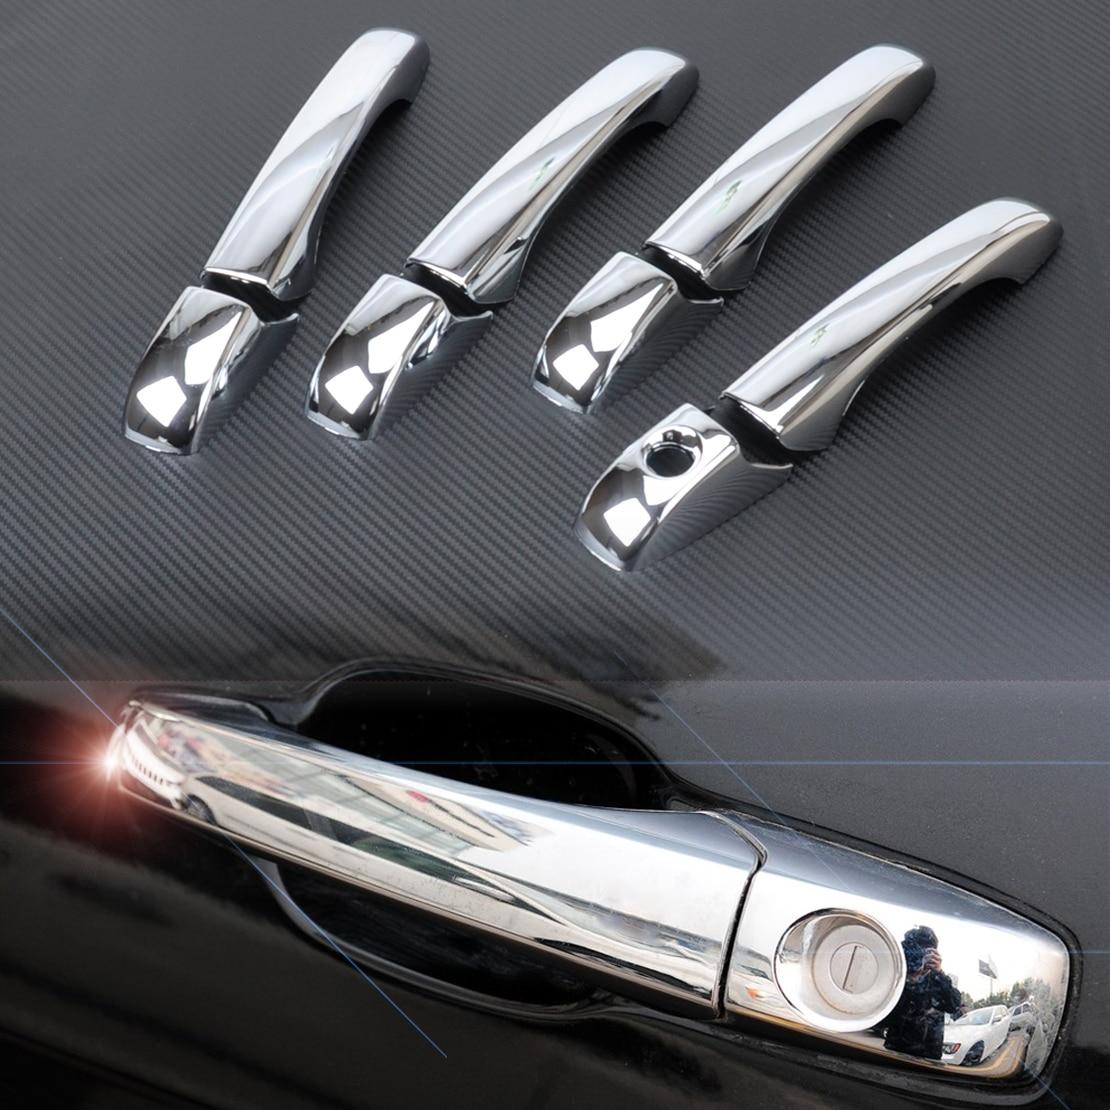 DWCX Car Chrome Door Handle Cover Trim For Chrysler 200